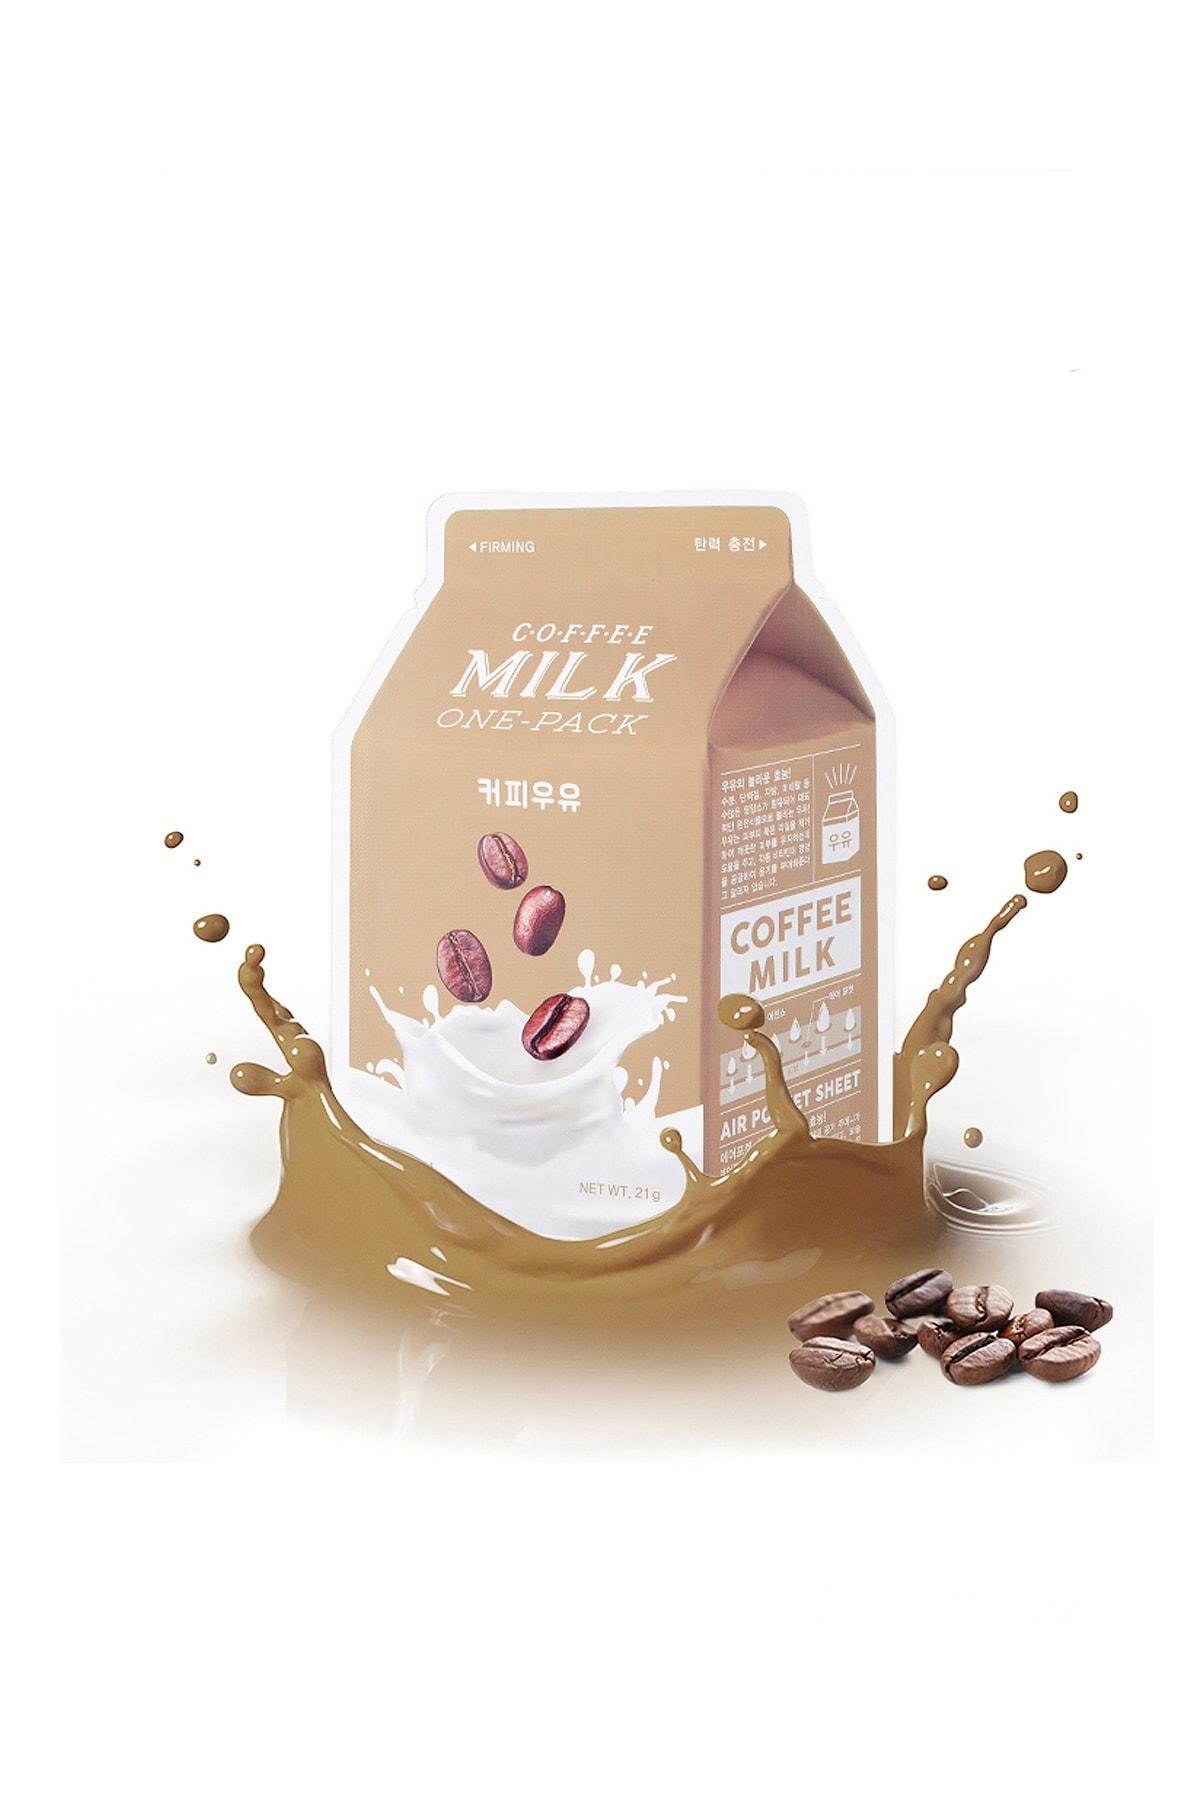 Missha Yaşlanma Karşıtı Yaprak Maske(Kahve-Süt) APIEU Coffee Milk One-Pack